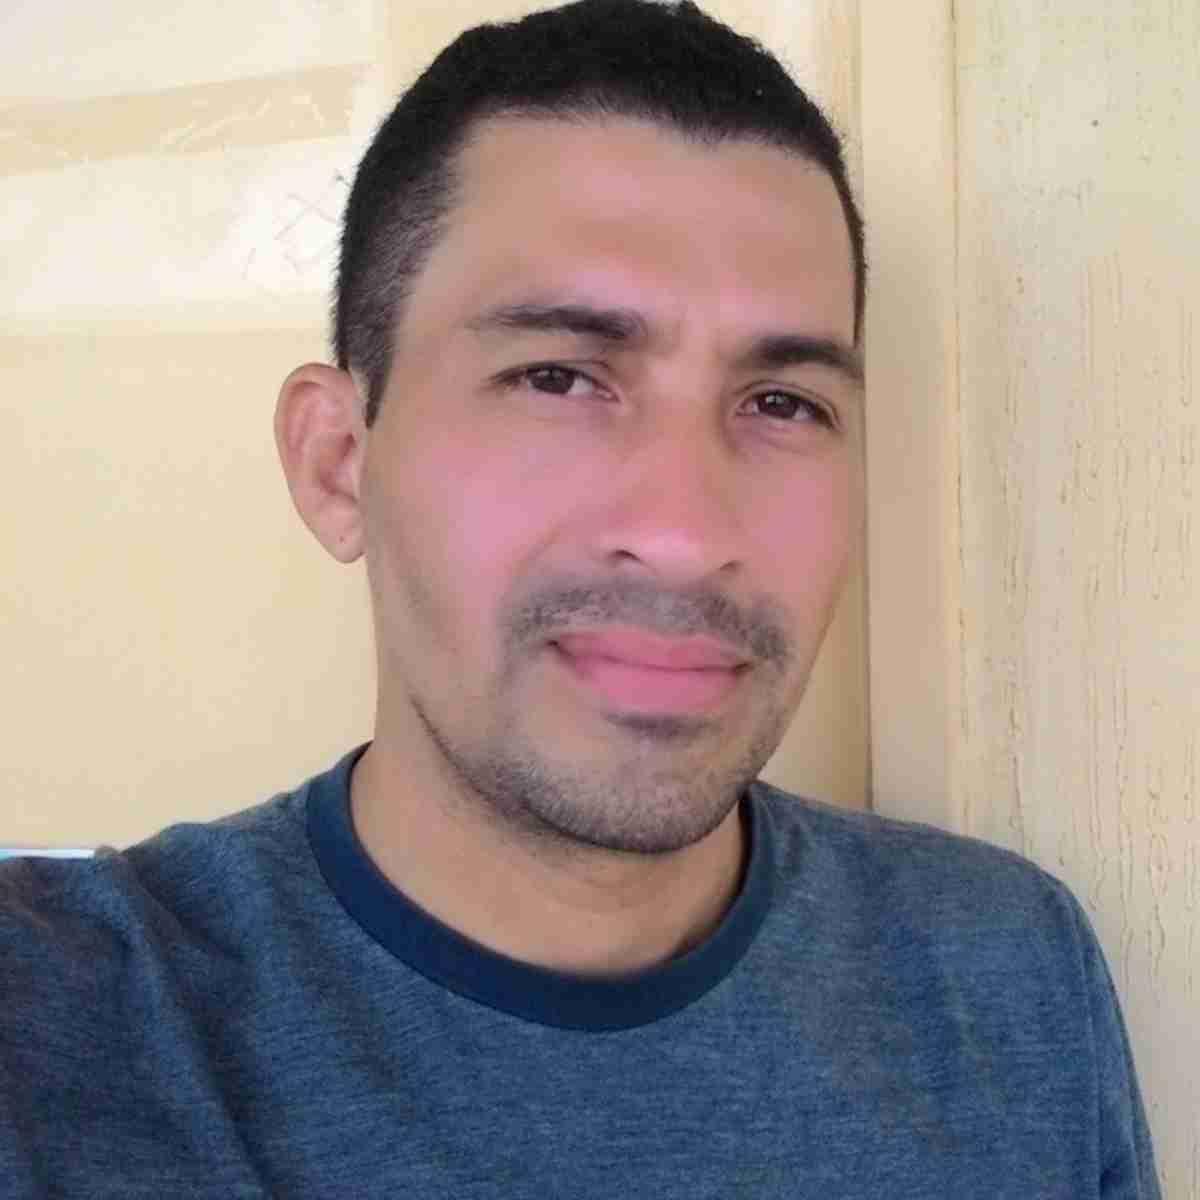 Fabiano da Silva Ferreira